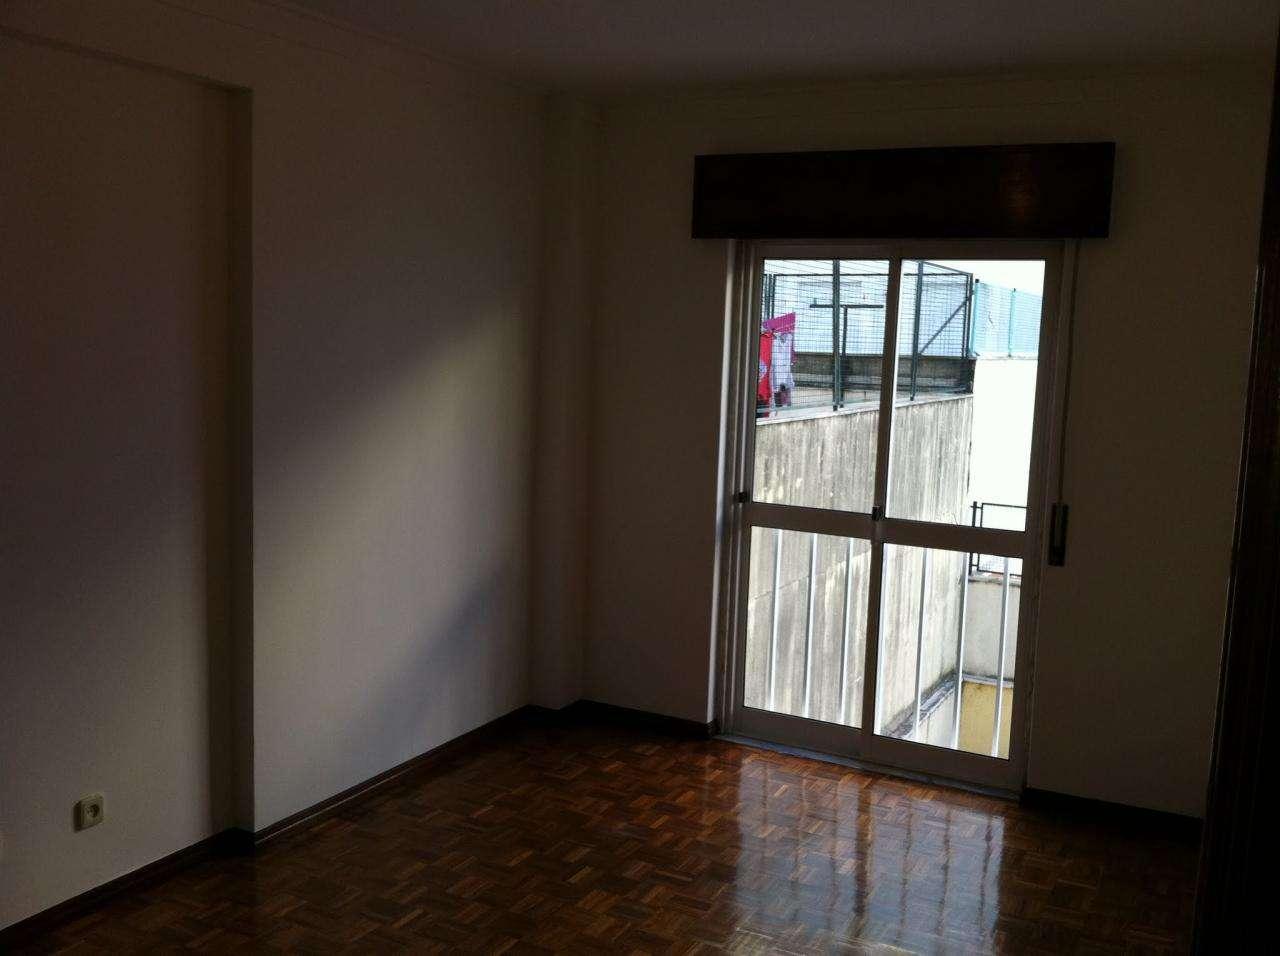 Apartamento para comprar, Rio de Mouro, Sintra, Lisboa - Foto 4